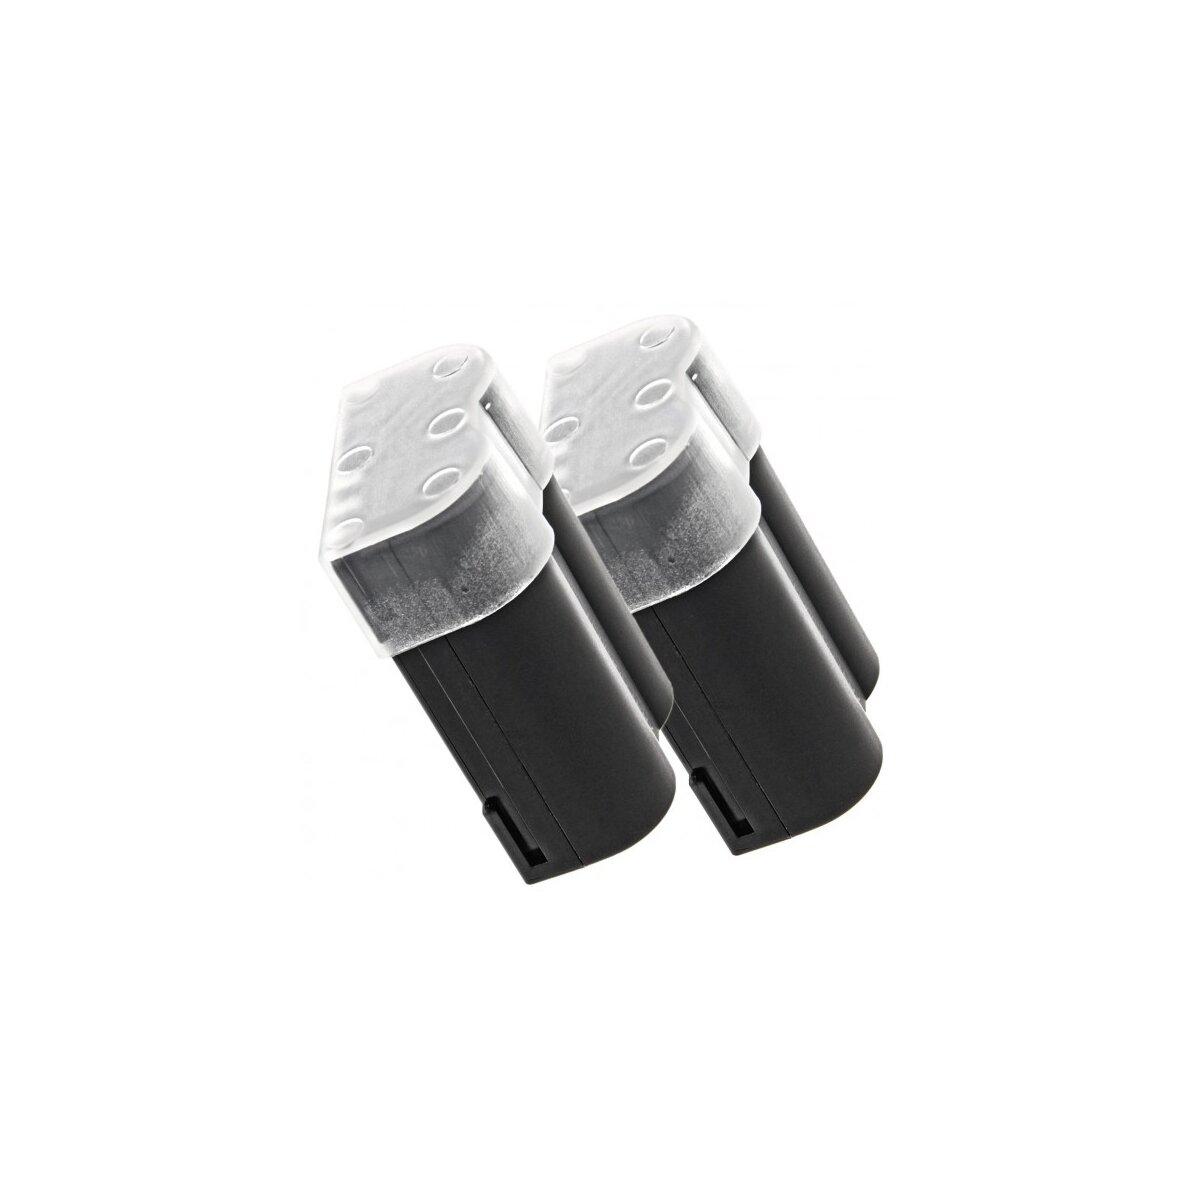 2x Minadax® Qualitaetsakku mit echten 1400 mAh fuer Olympus E-500 E-510 E-520 E1 E3 E30 E300 E330, wie BLM-1 - Intelligentes Akkusystem mit Chip